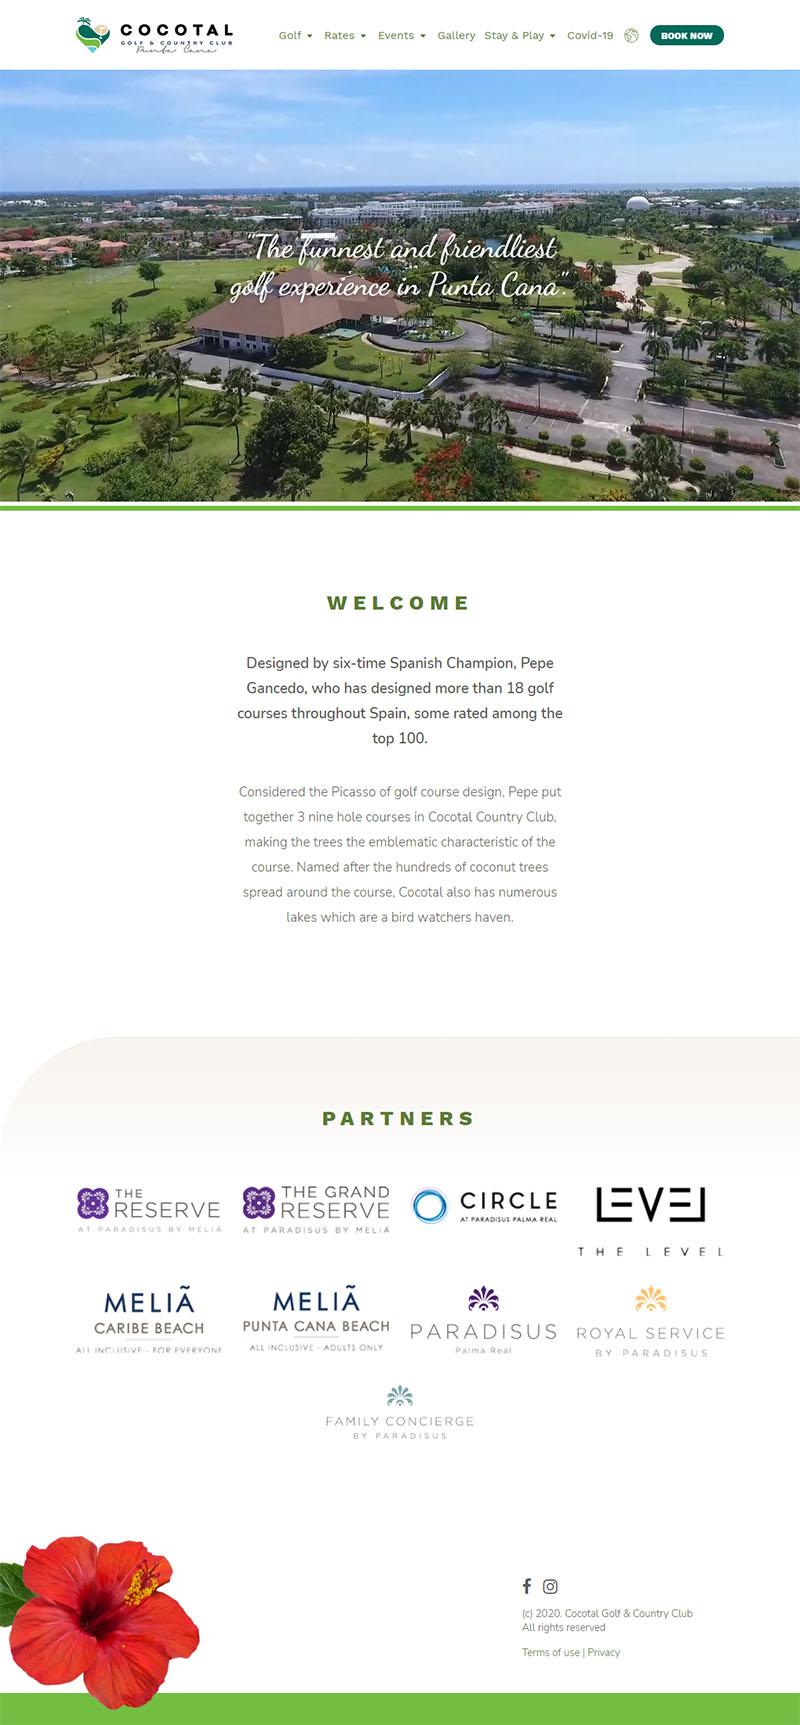 Cocotal Golf - Diseño de website